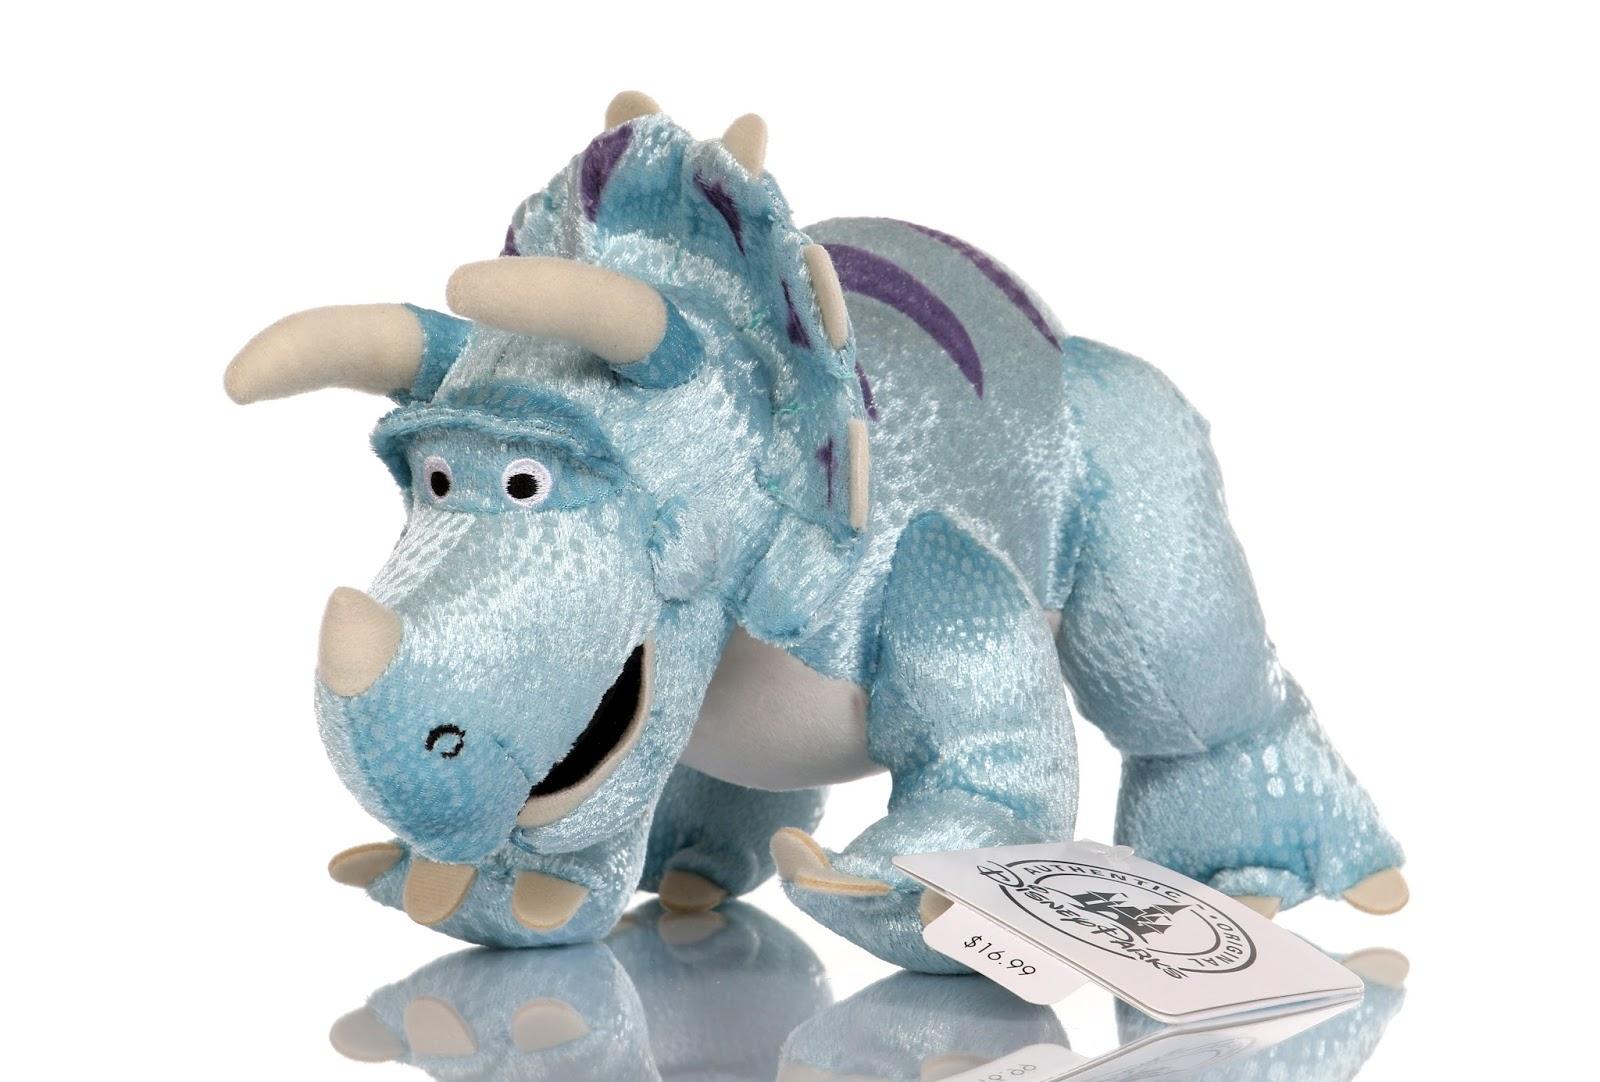 toy story disney parks trixie plush toy